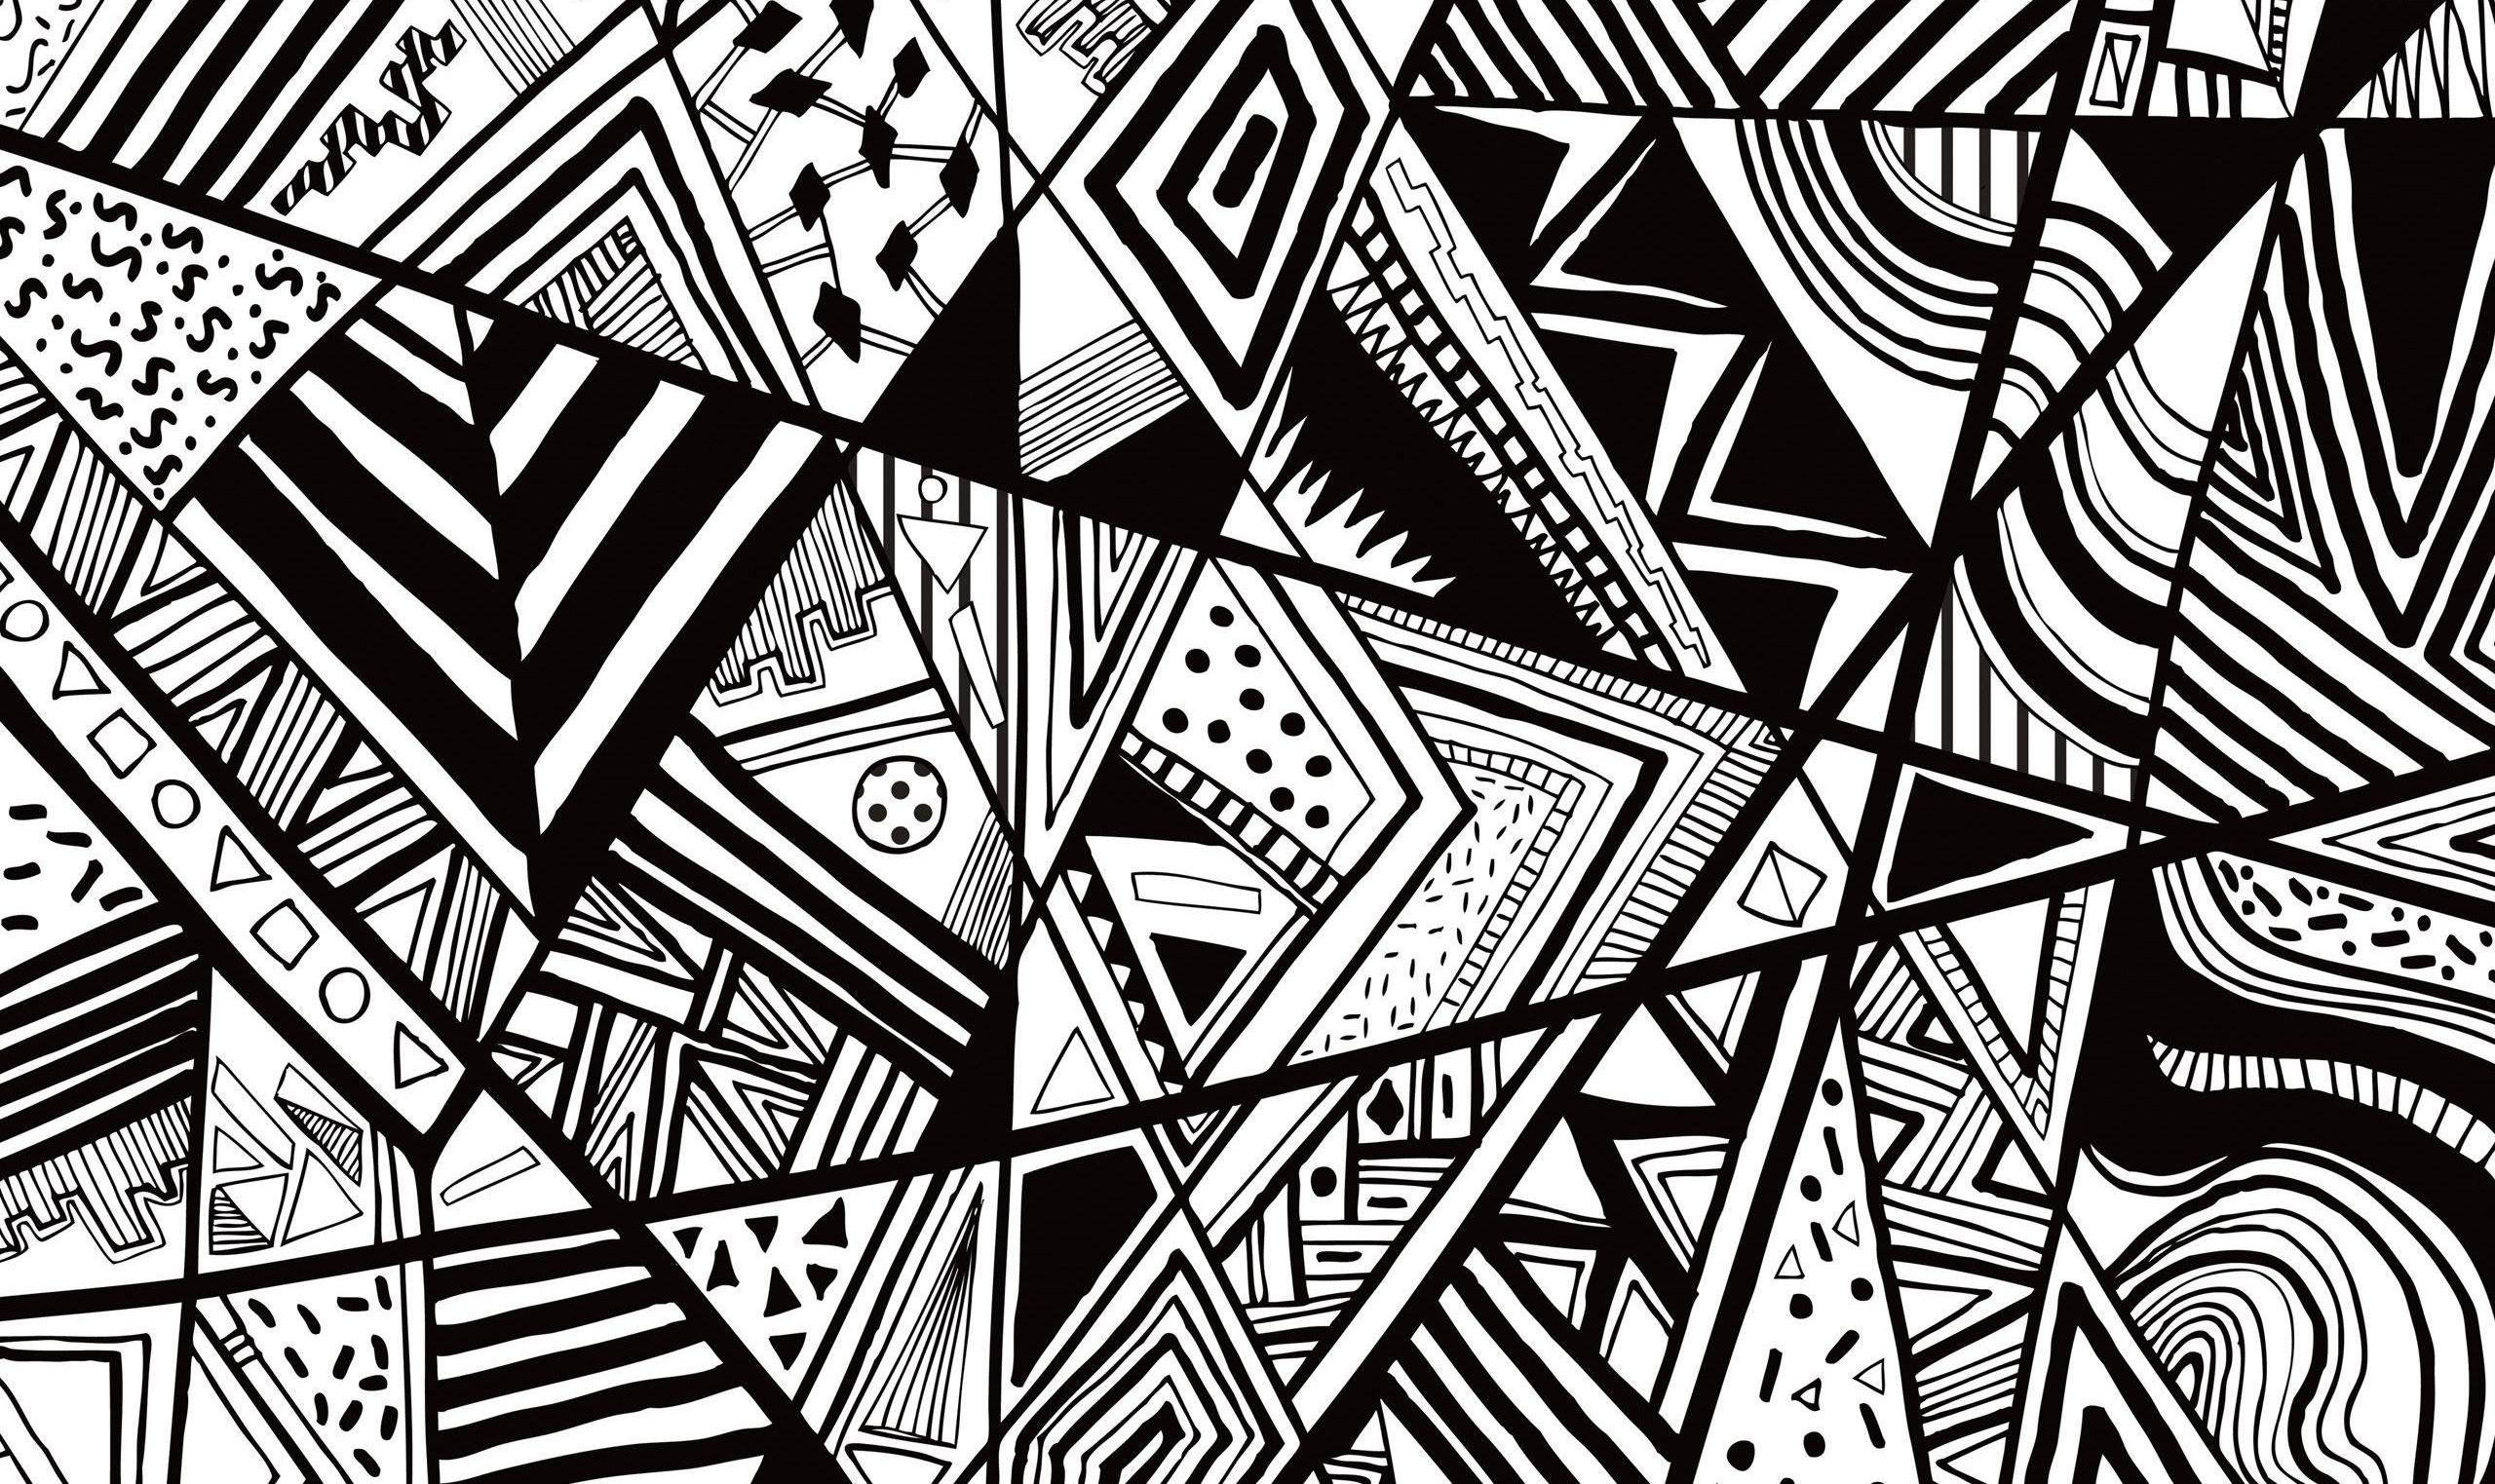 Fall Hd Wallpapers For Mac Doodle Backgrounds Hd Pixelstalk Net